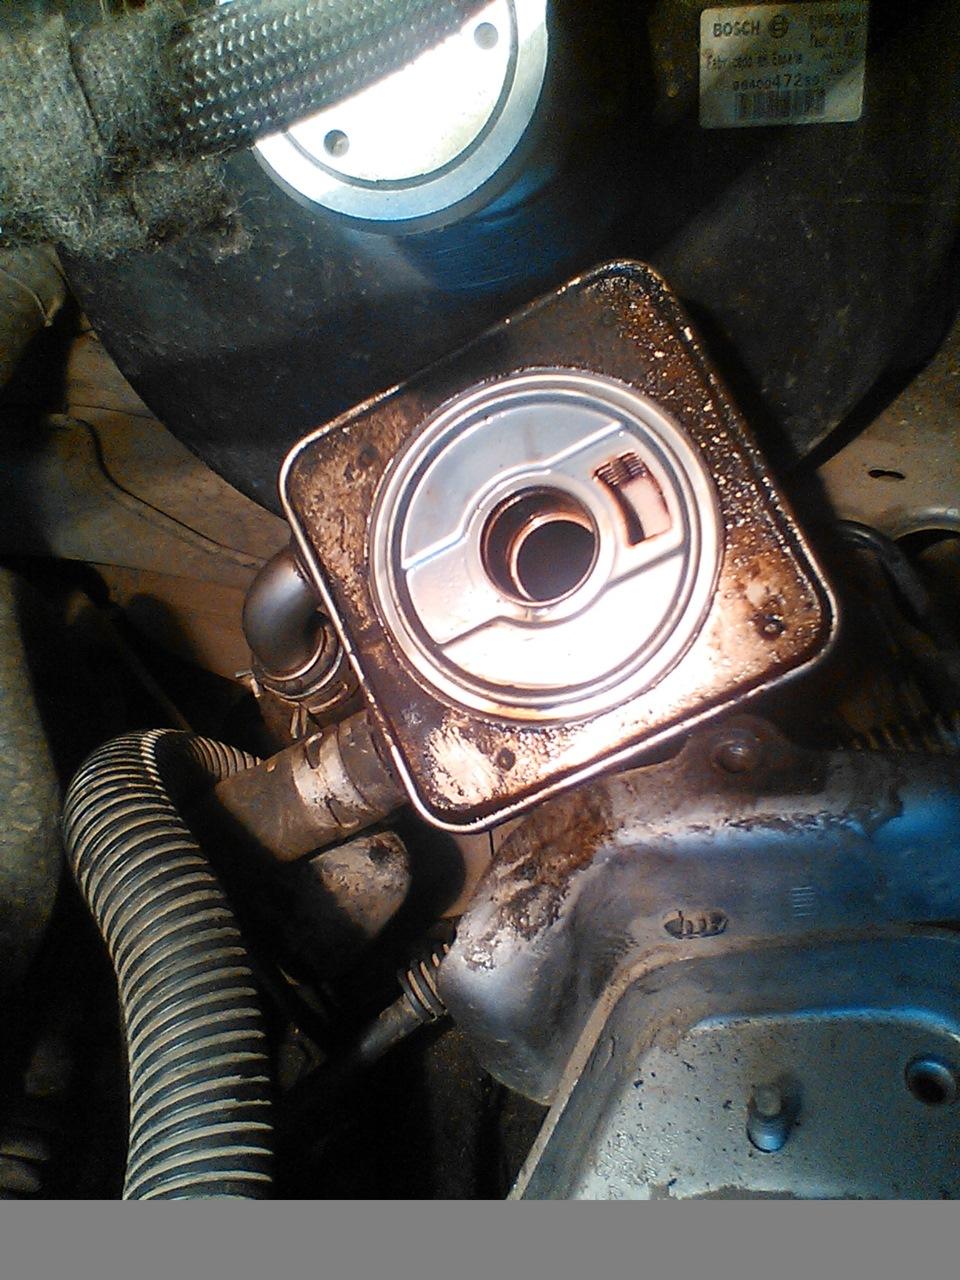 Al4 замена теплообменника Паяный теплообменник охладитель Машимпэкс FPA 10x20-80 Таганрог